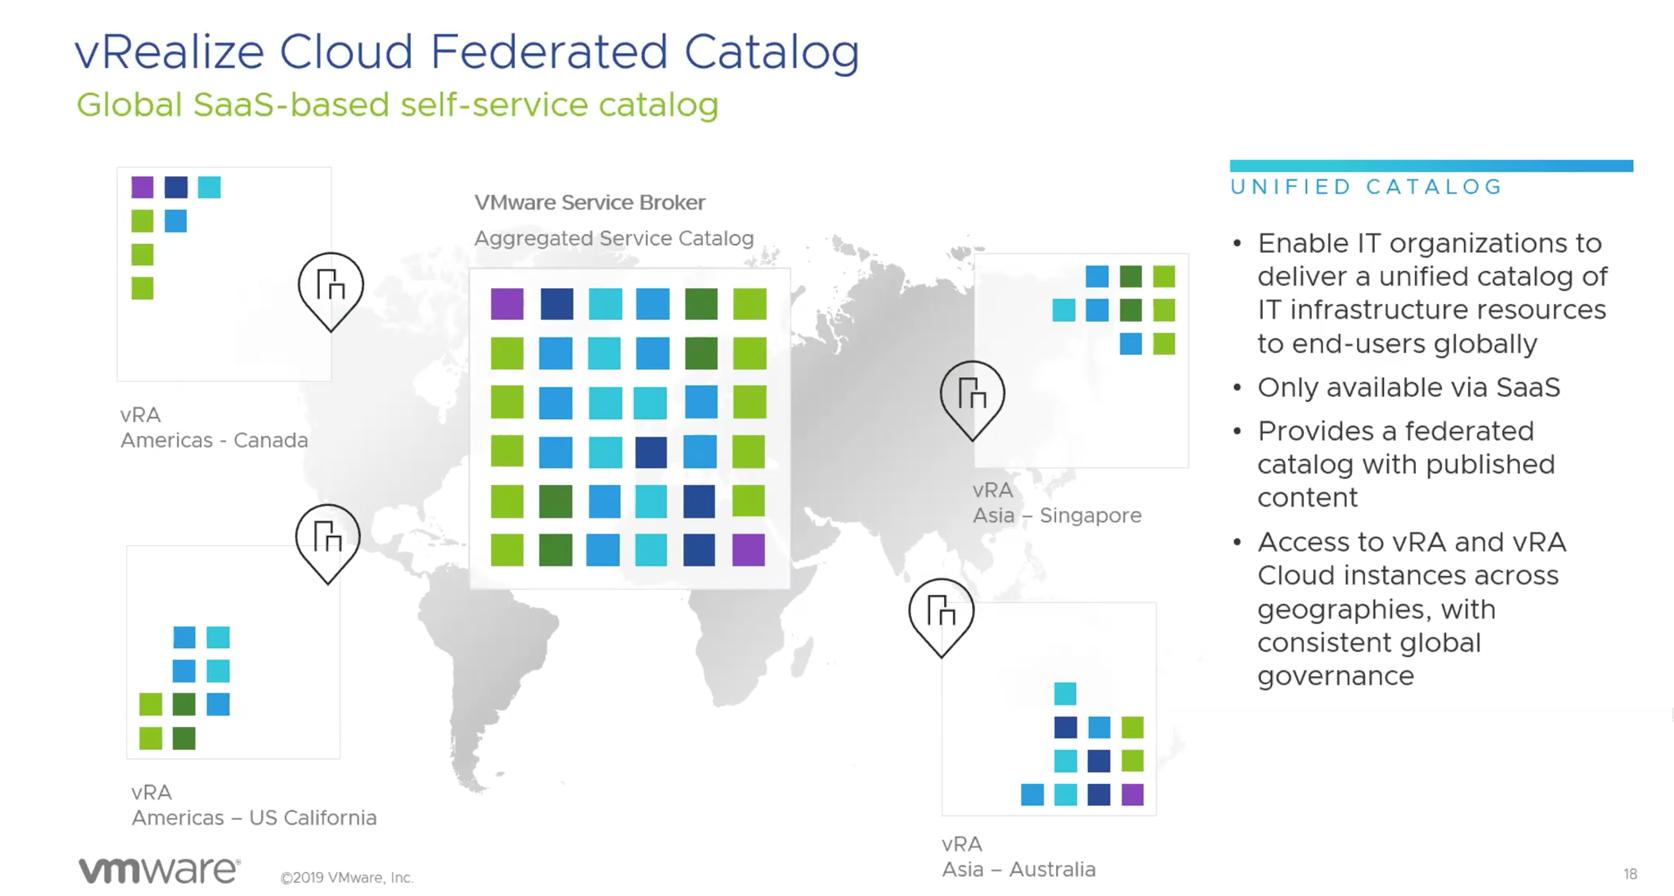 vRA Federation catalog